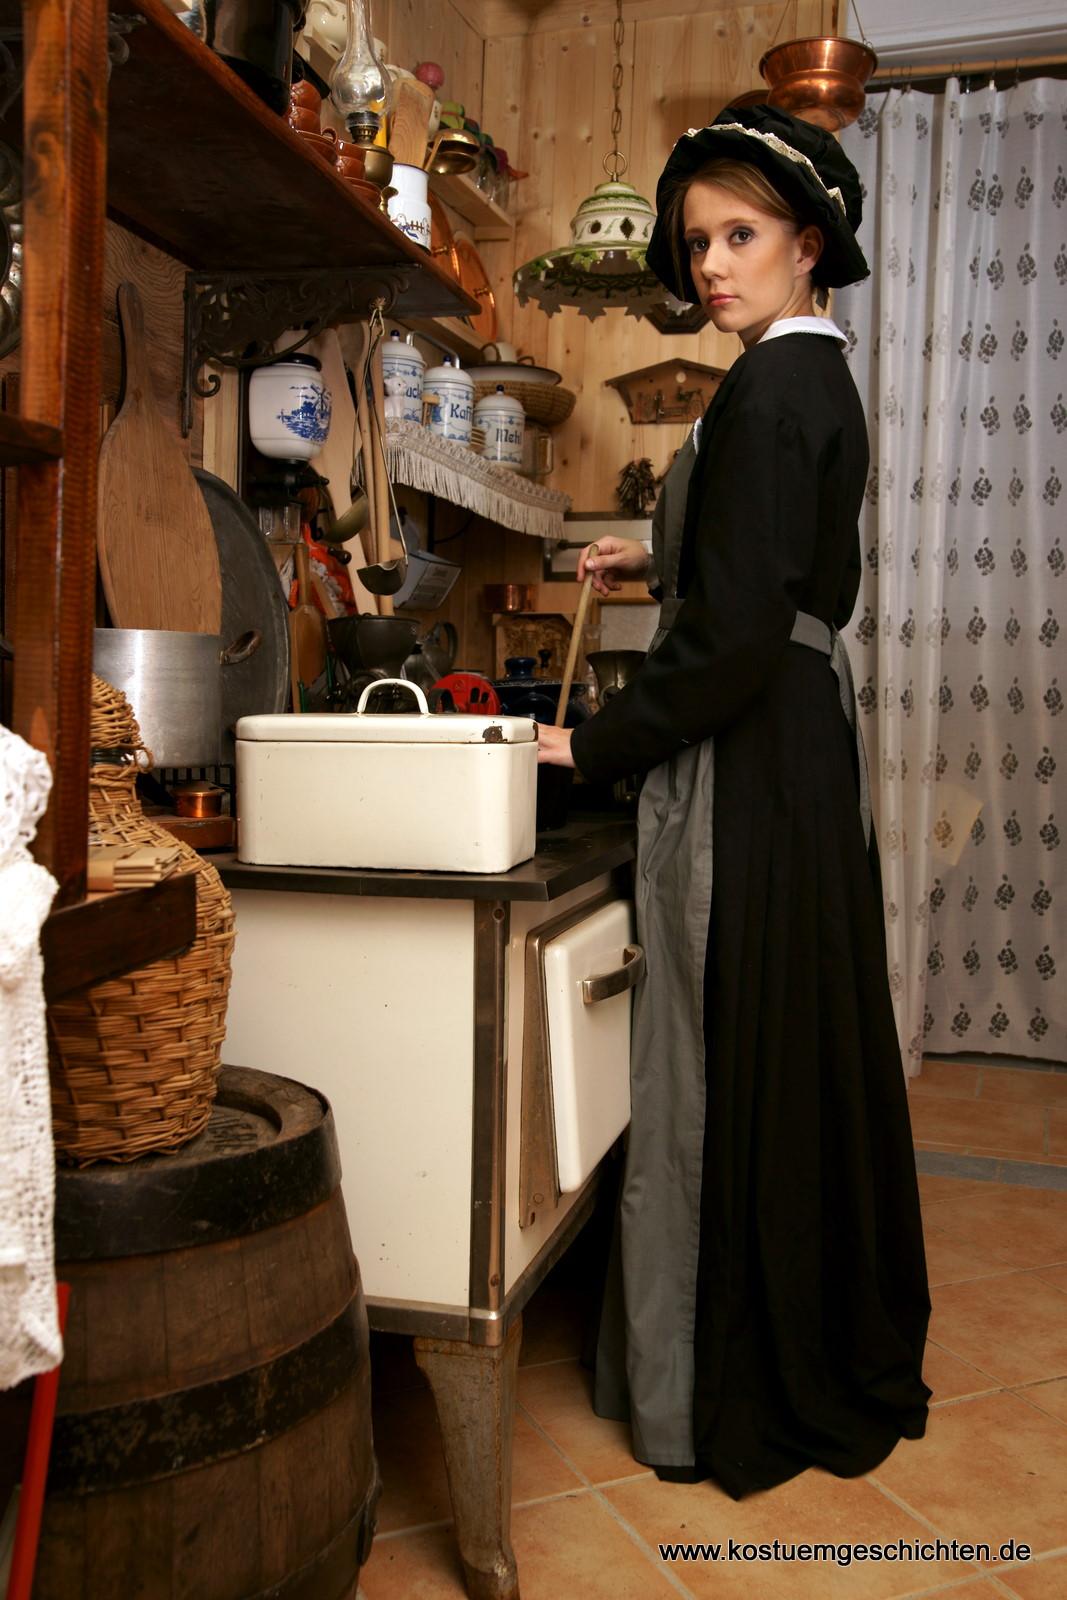 dienstmädchenkleid um 1850 - kostümverleih